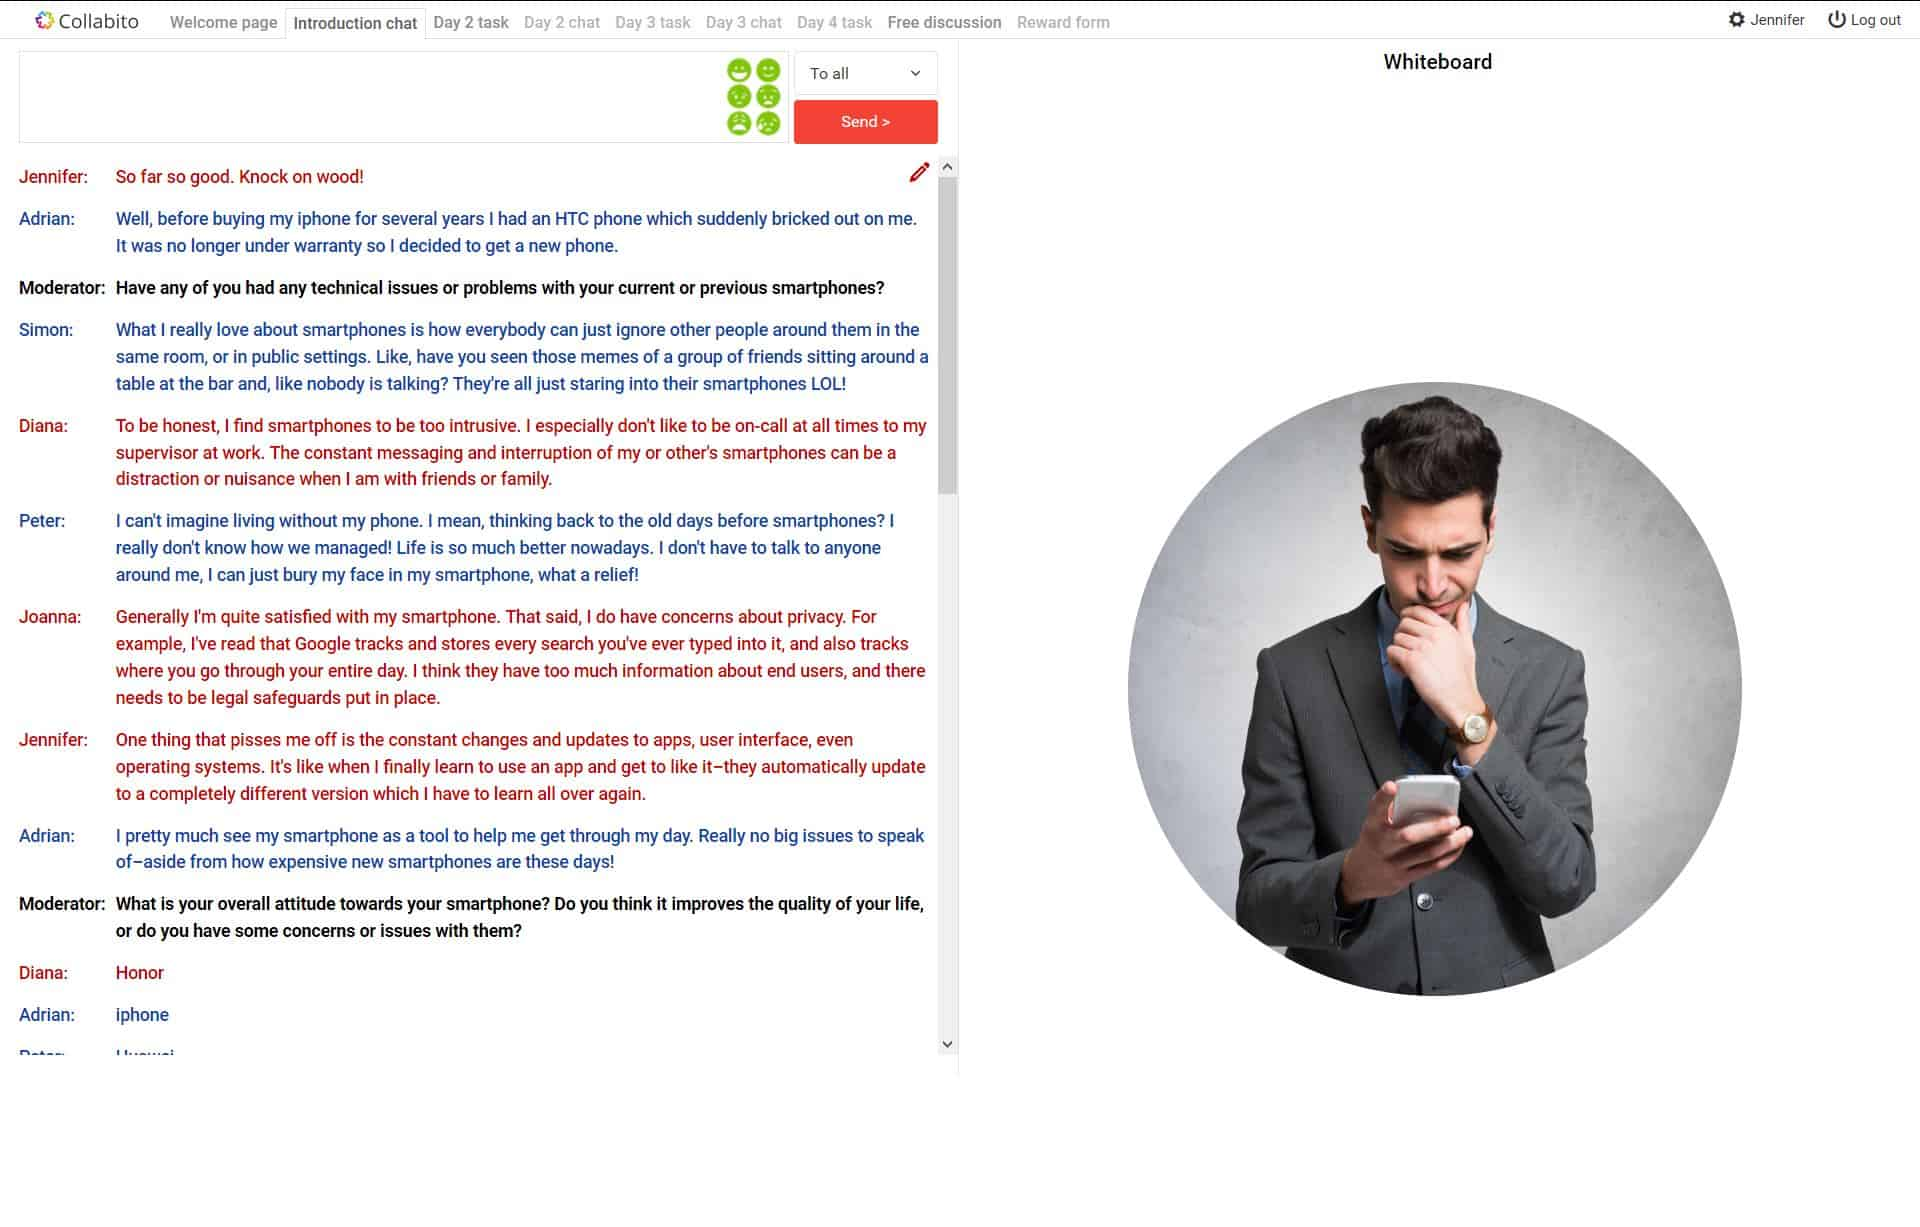 Online focus group - respondents